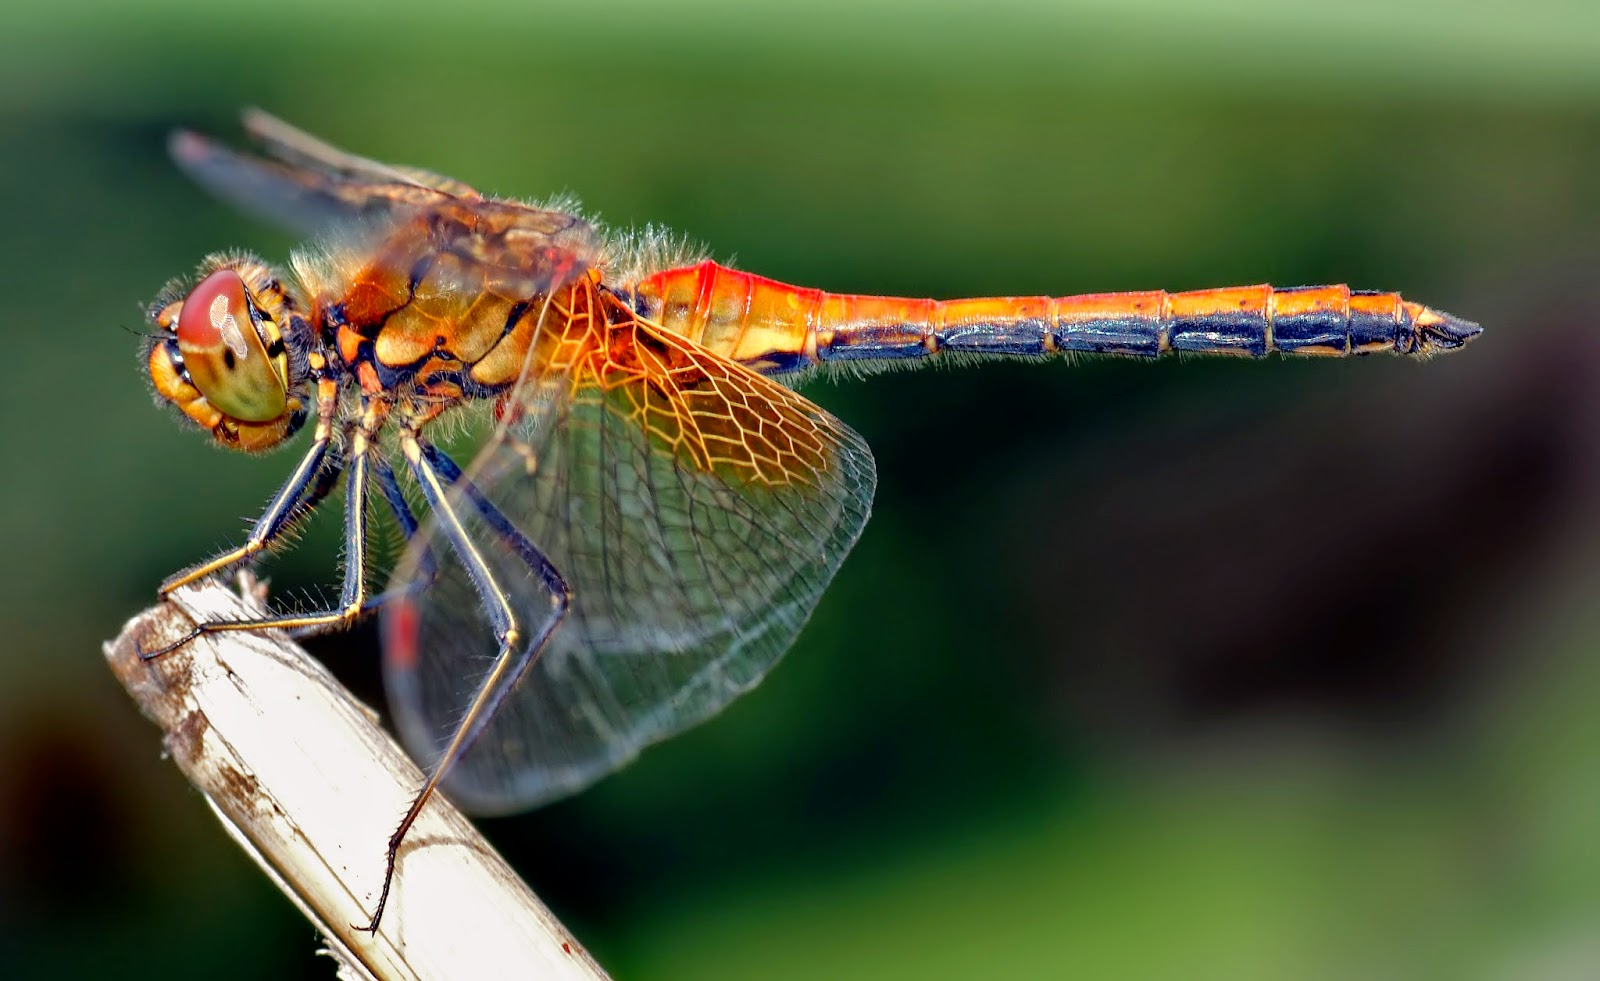 Dragonflies help control mosquitos